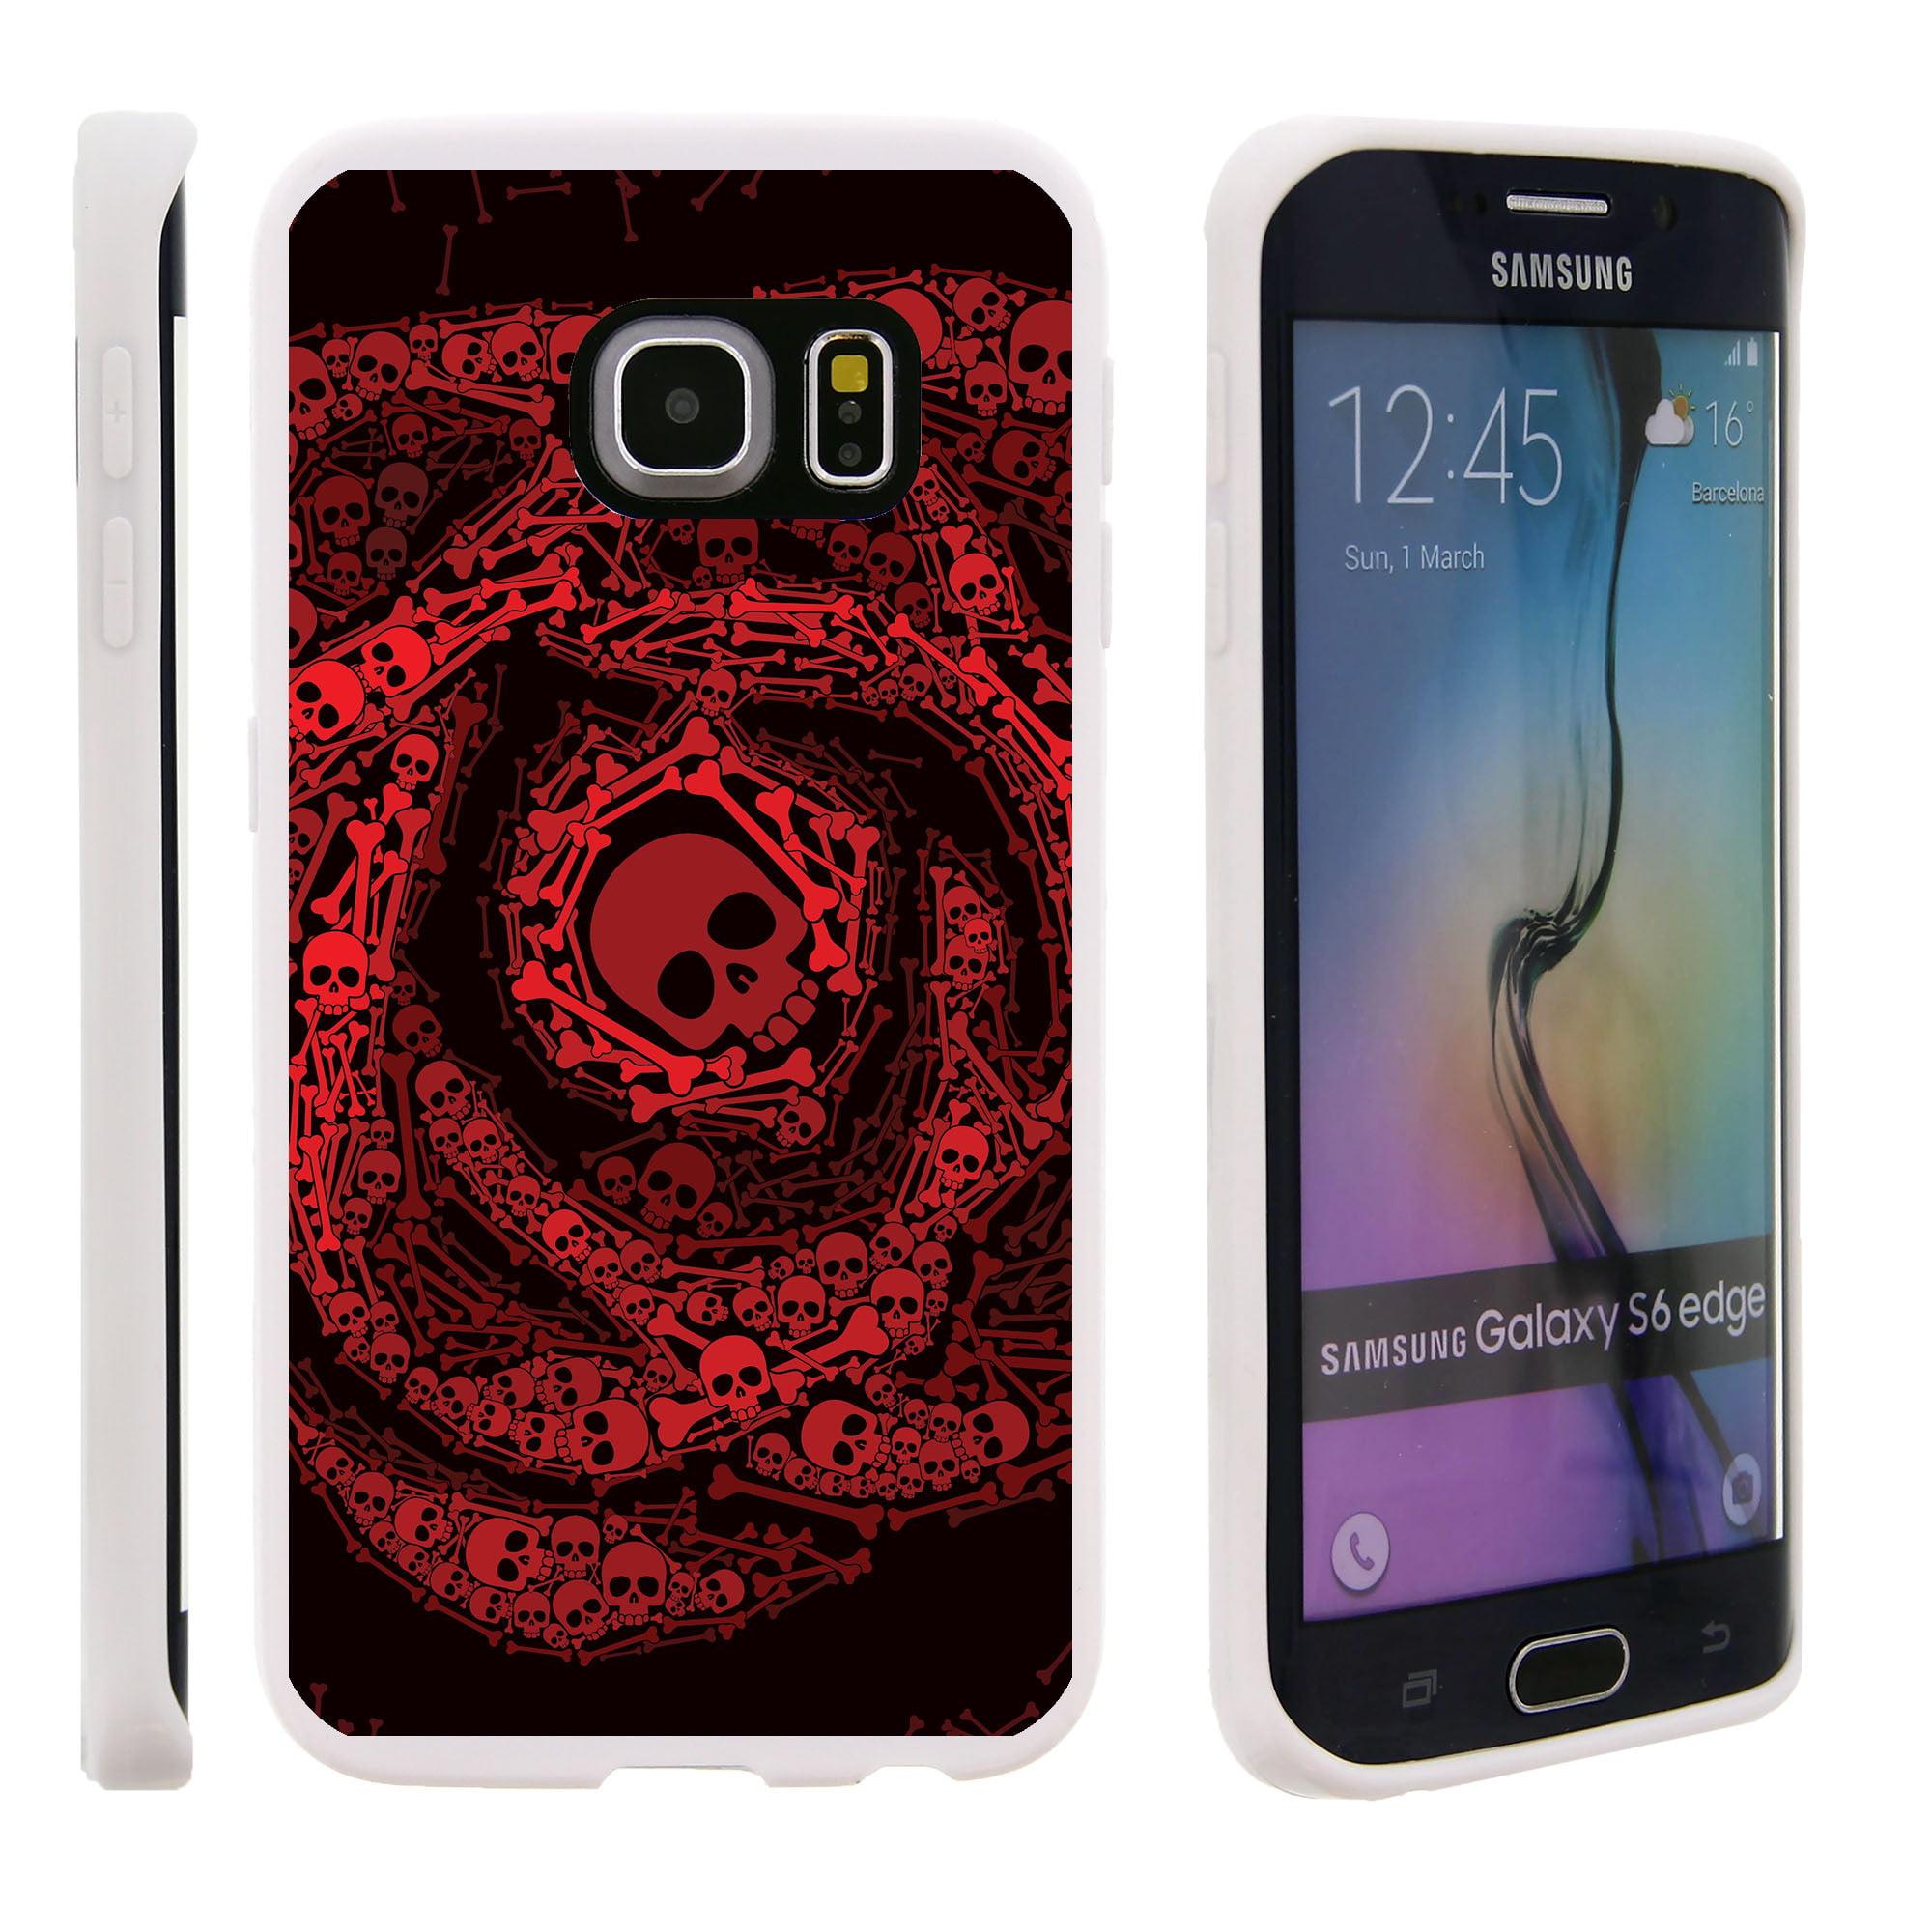 Samsung Galaxy S6 Edge G925, Flexible Case [FLEX FORCE] Slim Durable TPU Sleek Bumper with Unique Designs - Red Swirl Skulls